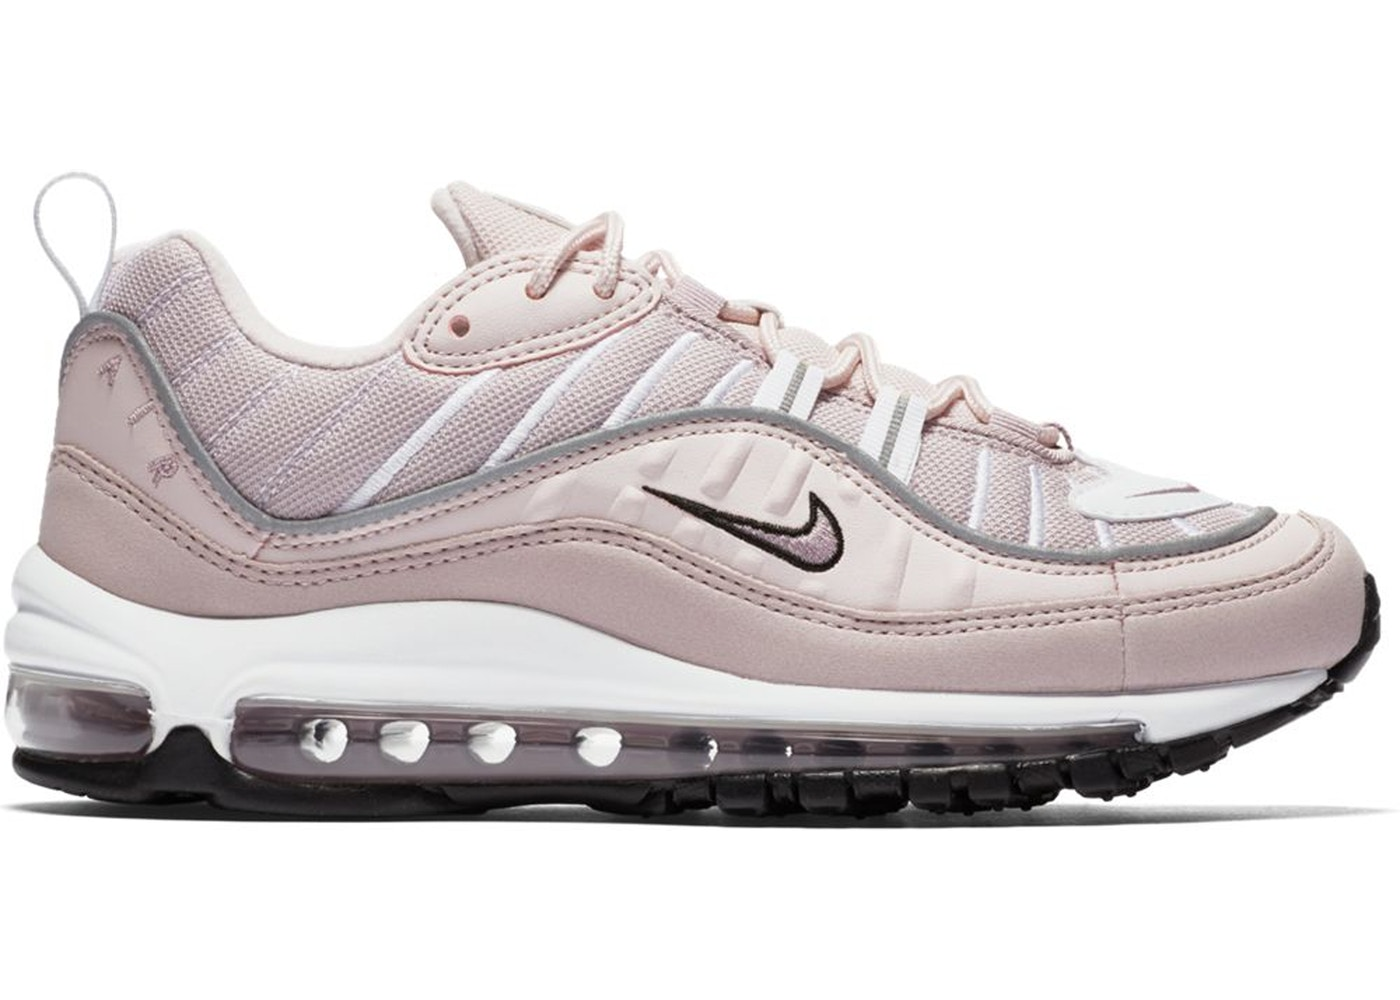 Nike Air Max 98 Barely Rose (W)